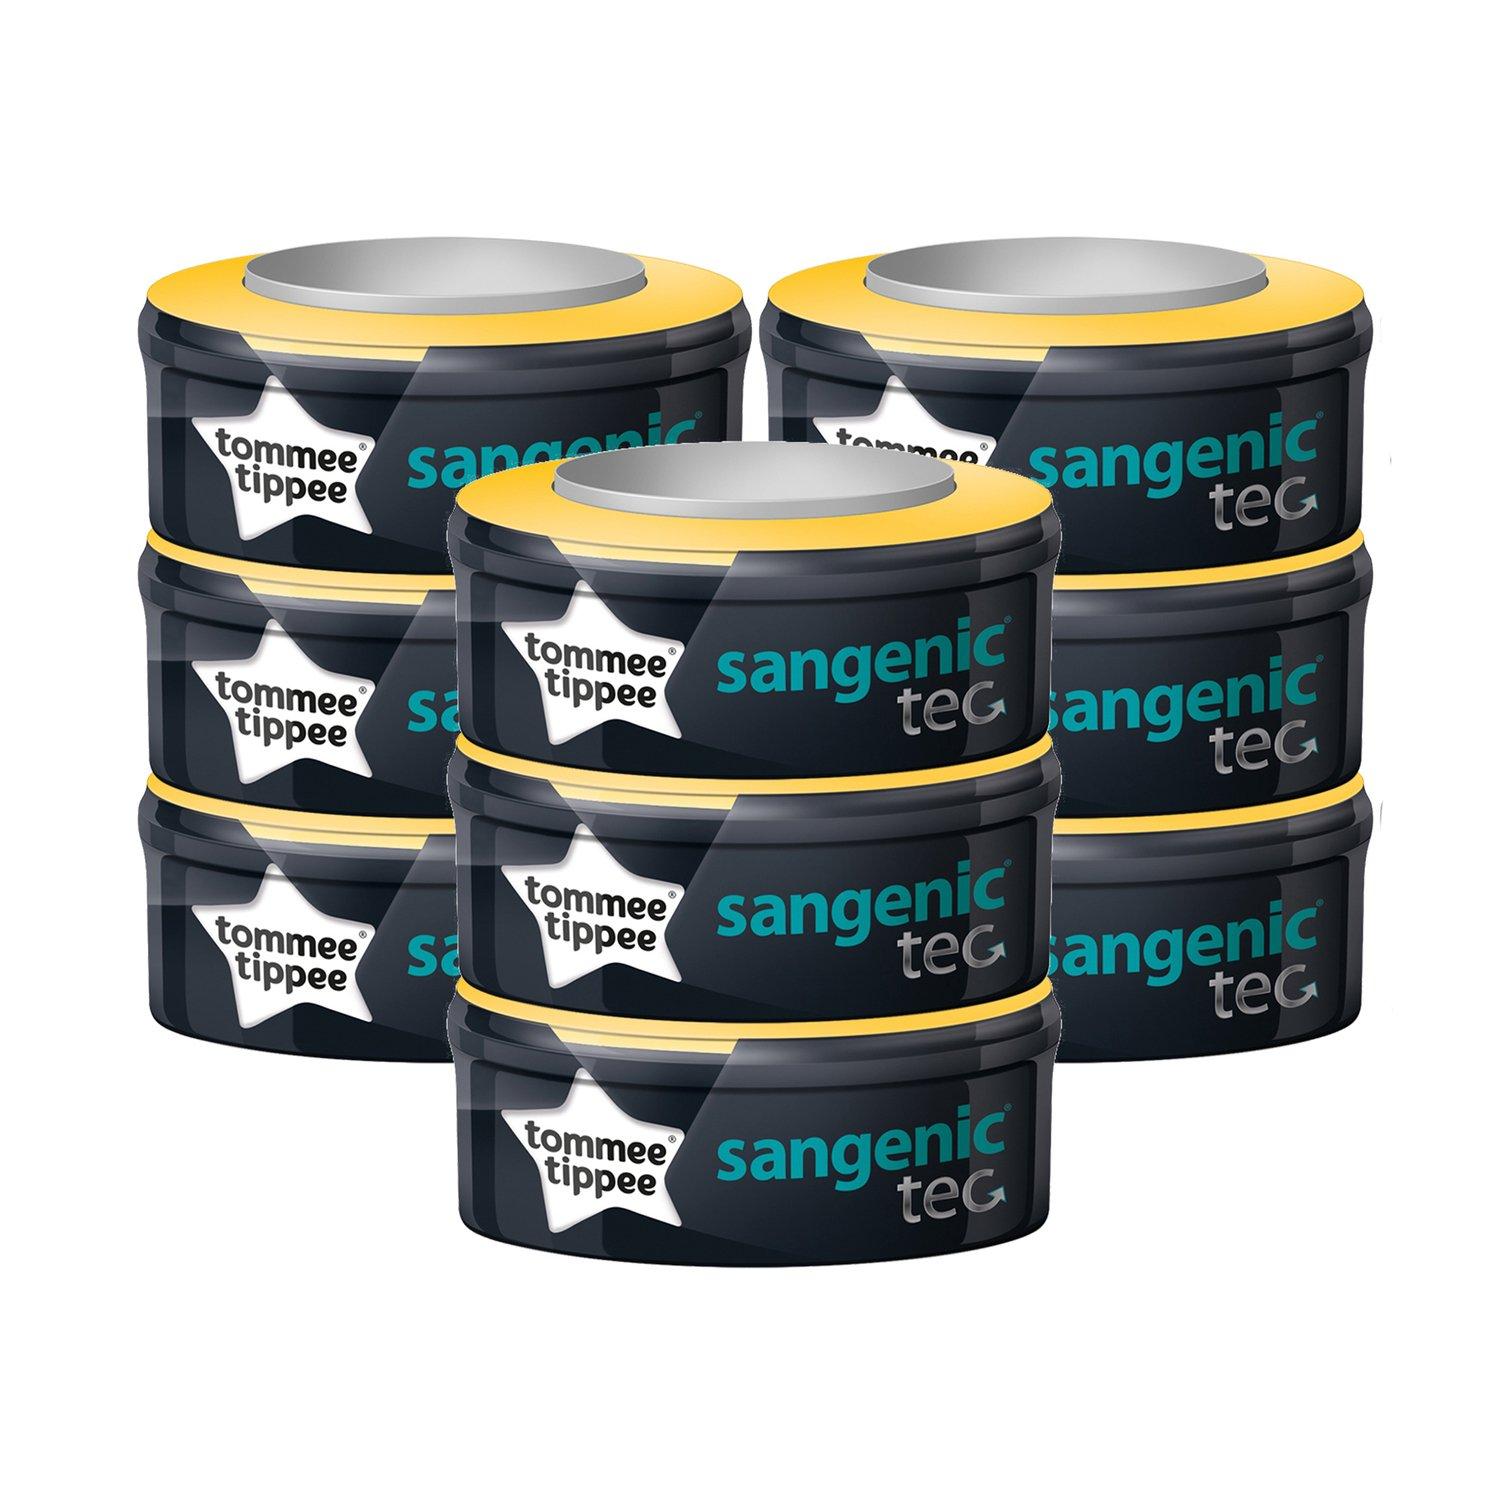 Tommee Tippee Sangenic Tec - Recambios para el contenedor (pack de 9) product image